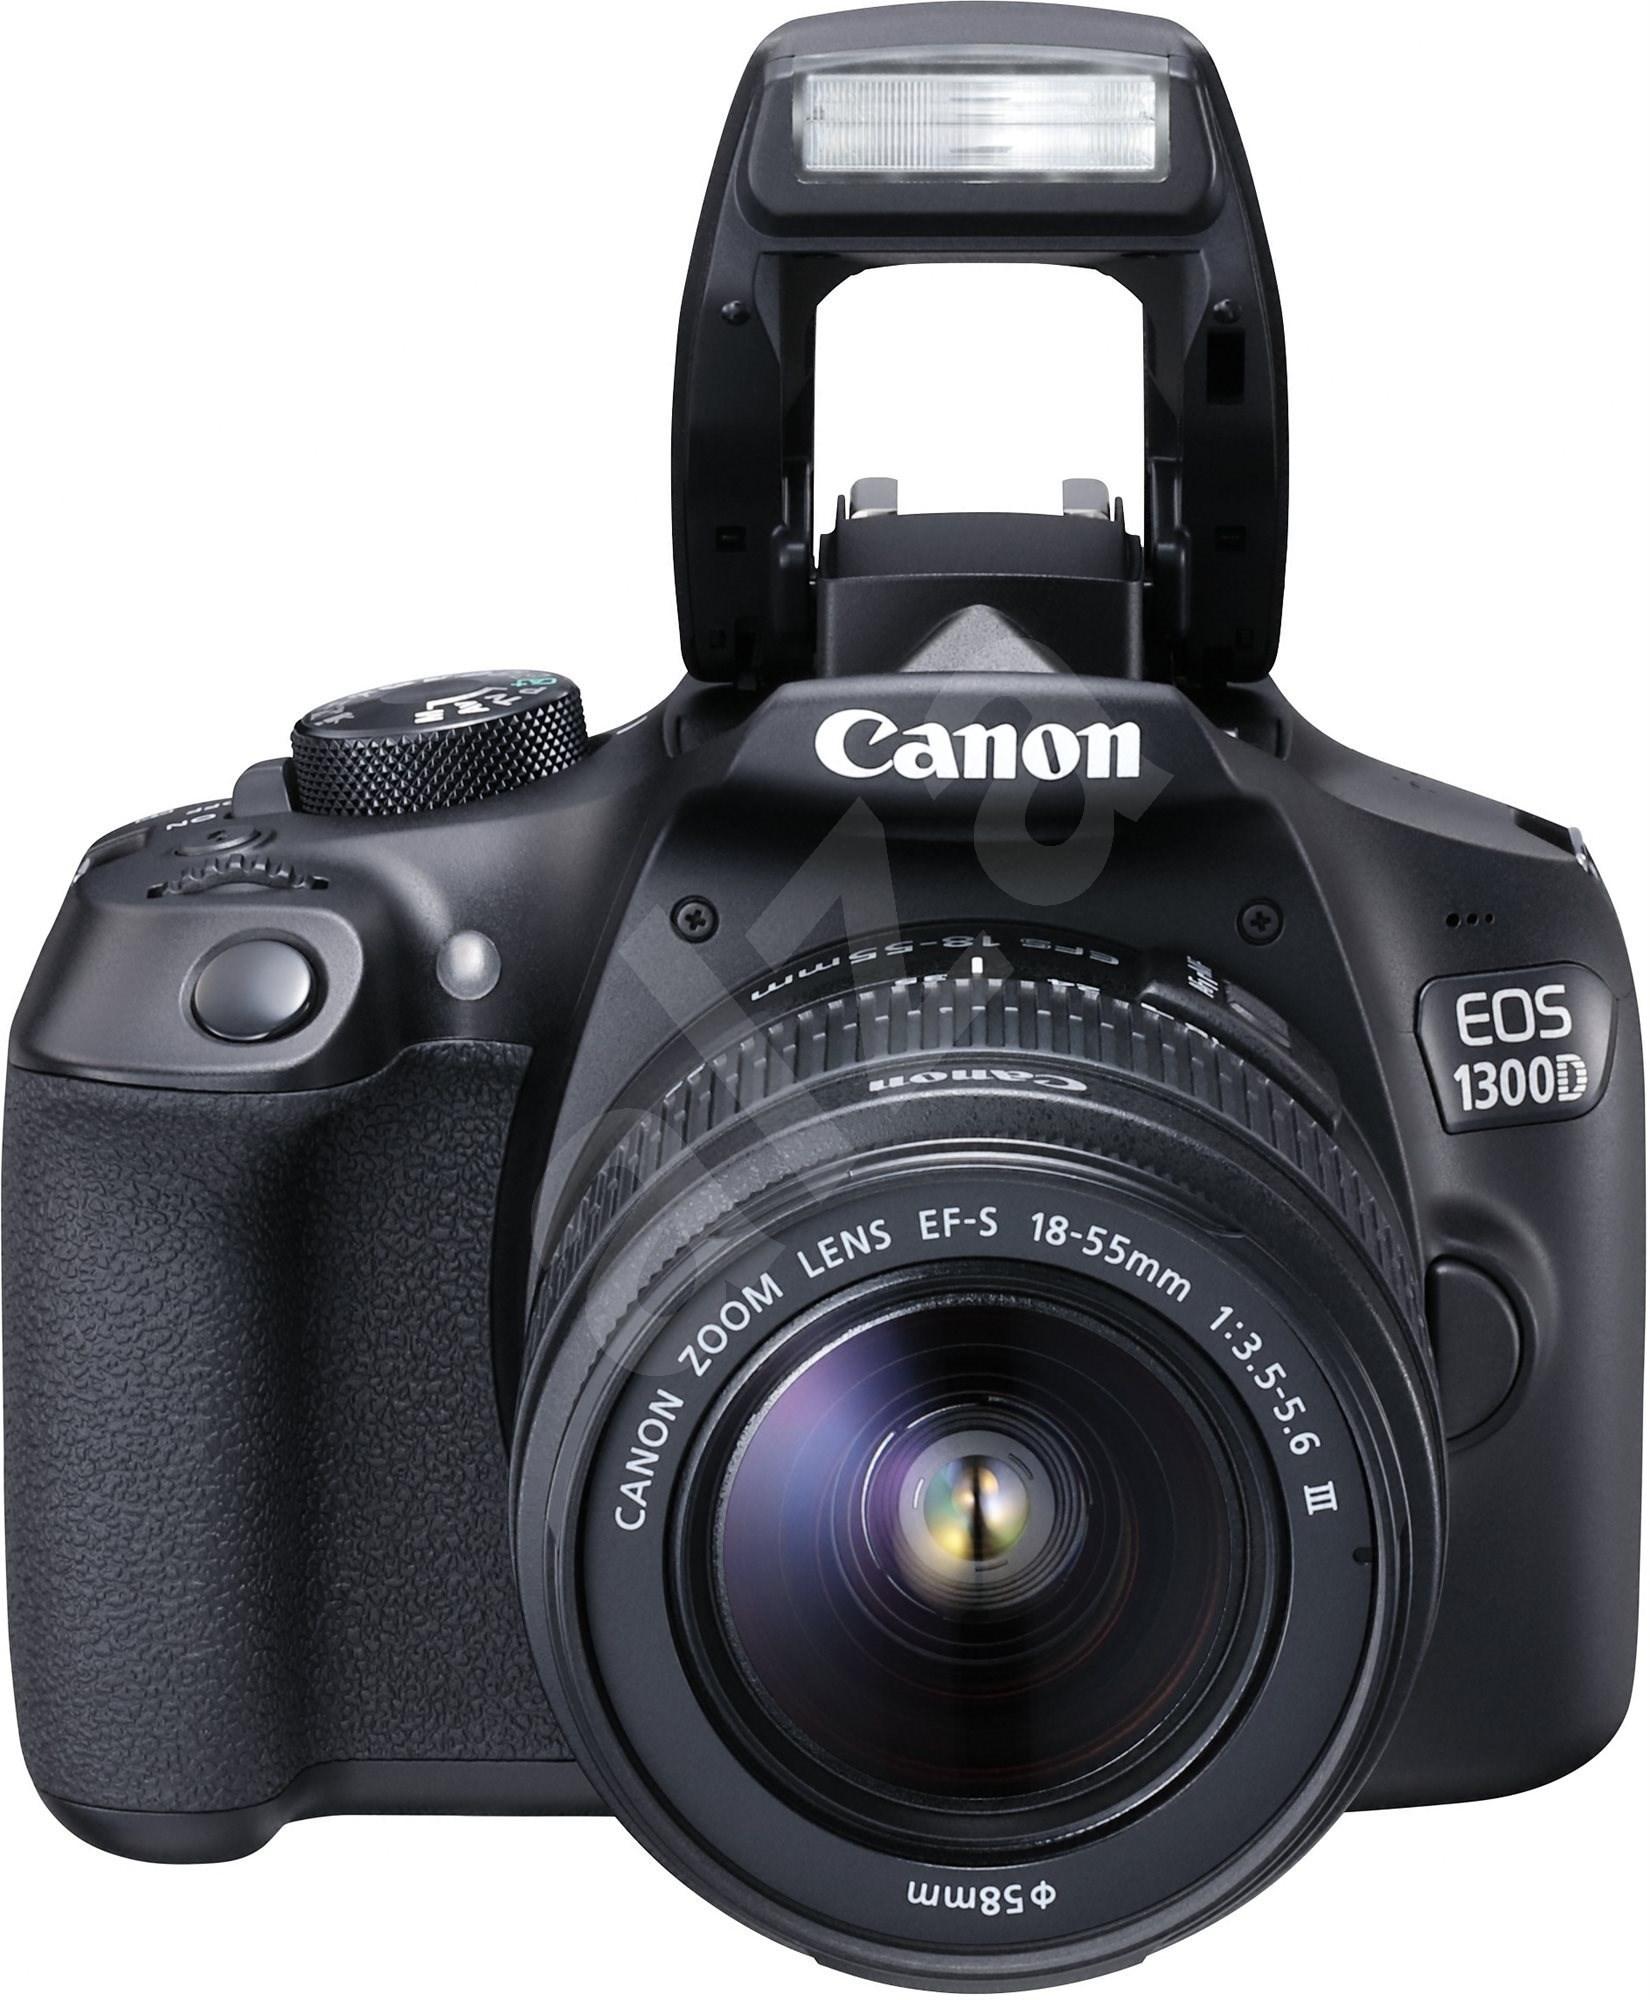 canon eos 1300d ef s 18 55mm dc tamron 70 300mm macro digitale spiegelreflexkamera. Black Bedroom Furniture Sets. Home Design Ideas